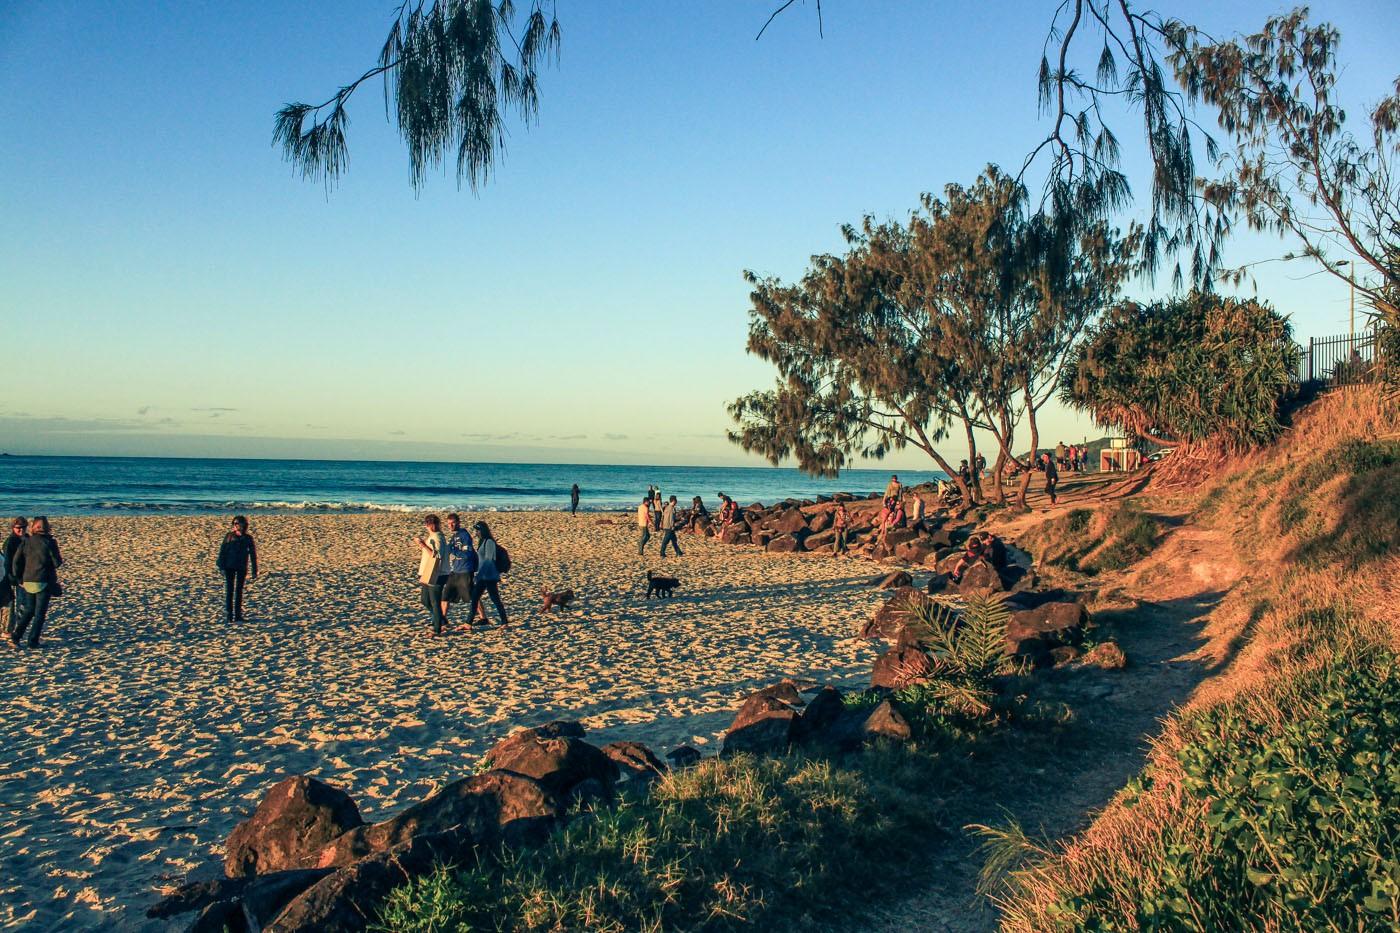 Trip to Australia cost: Another beautiful Australian beach!